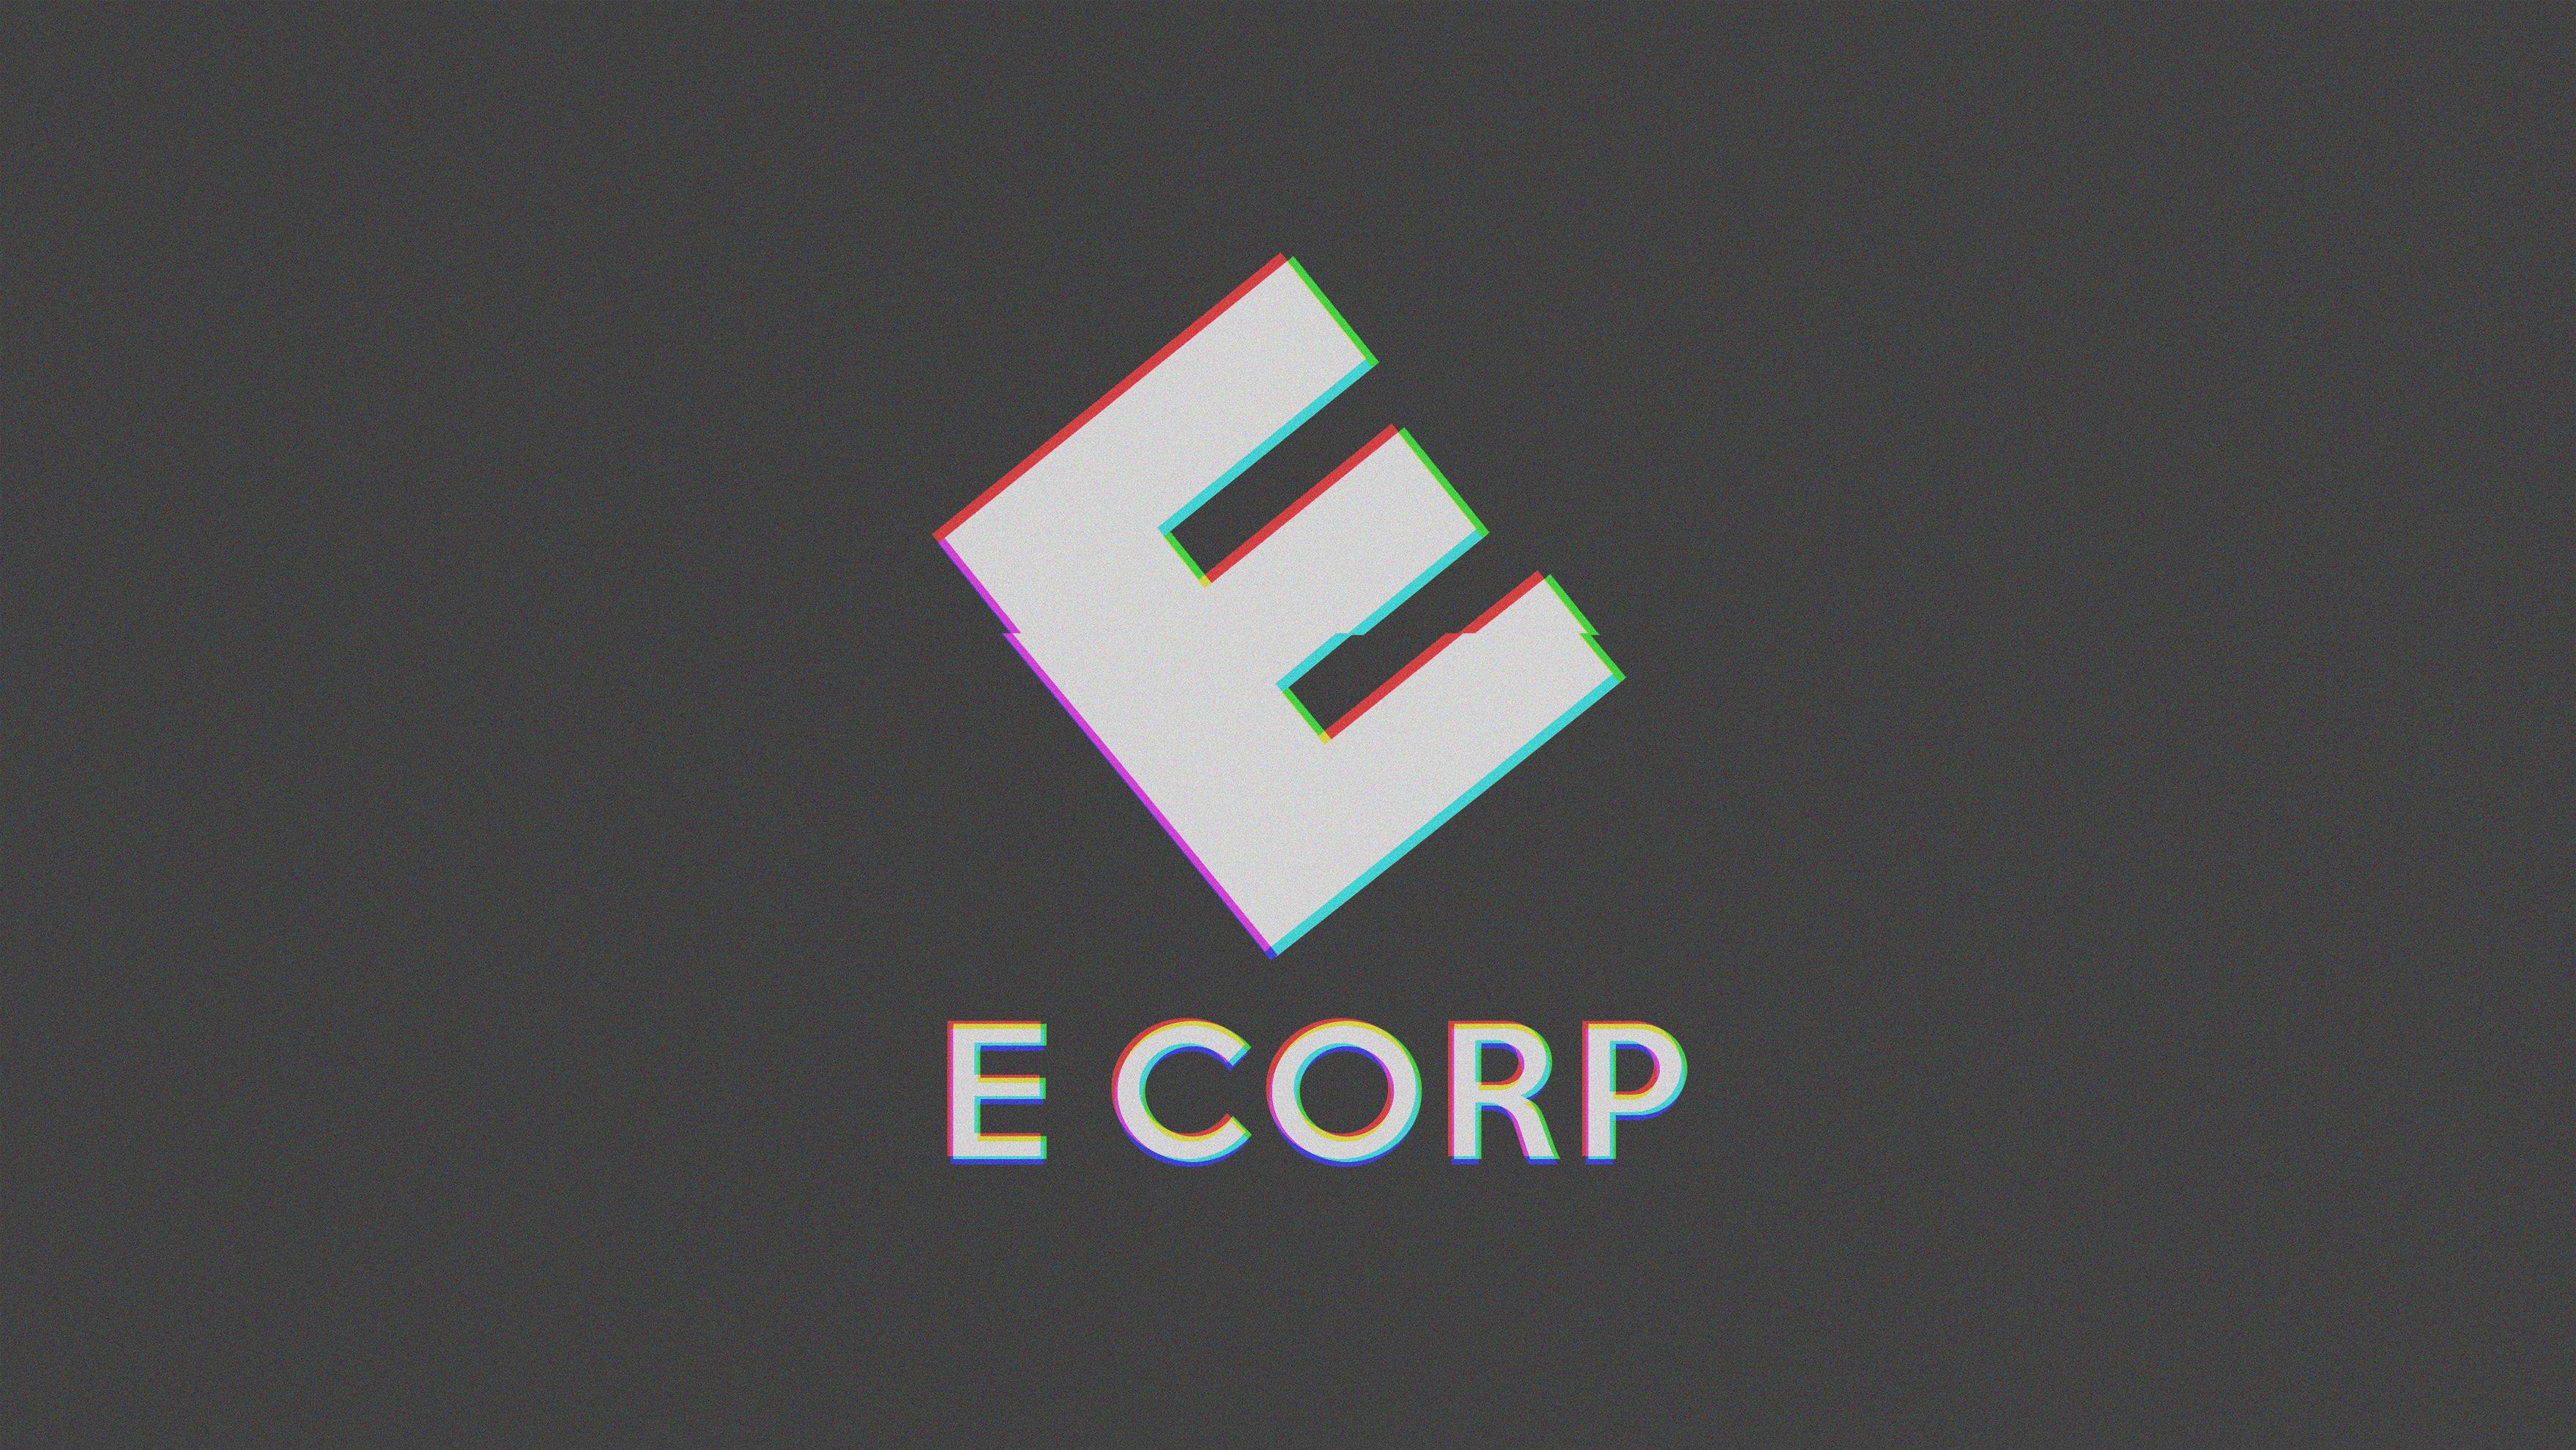 Wallpaper Mr Robot E Corp Evil Corp 3517x1979